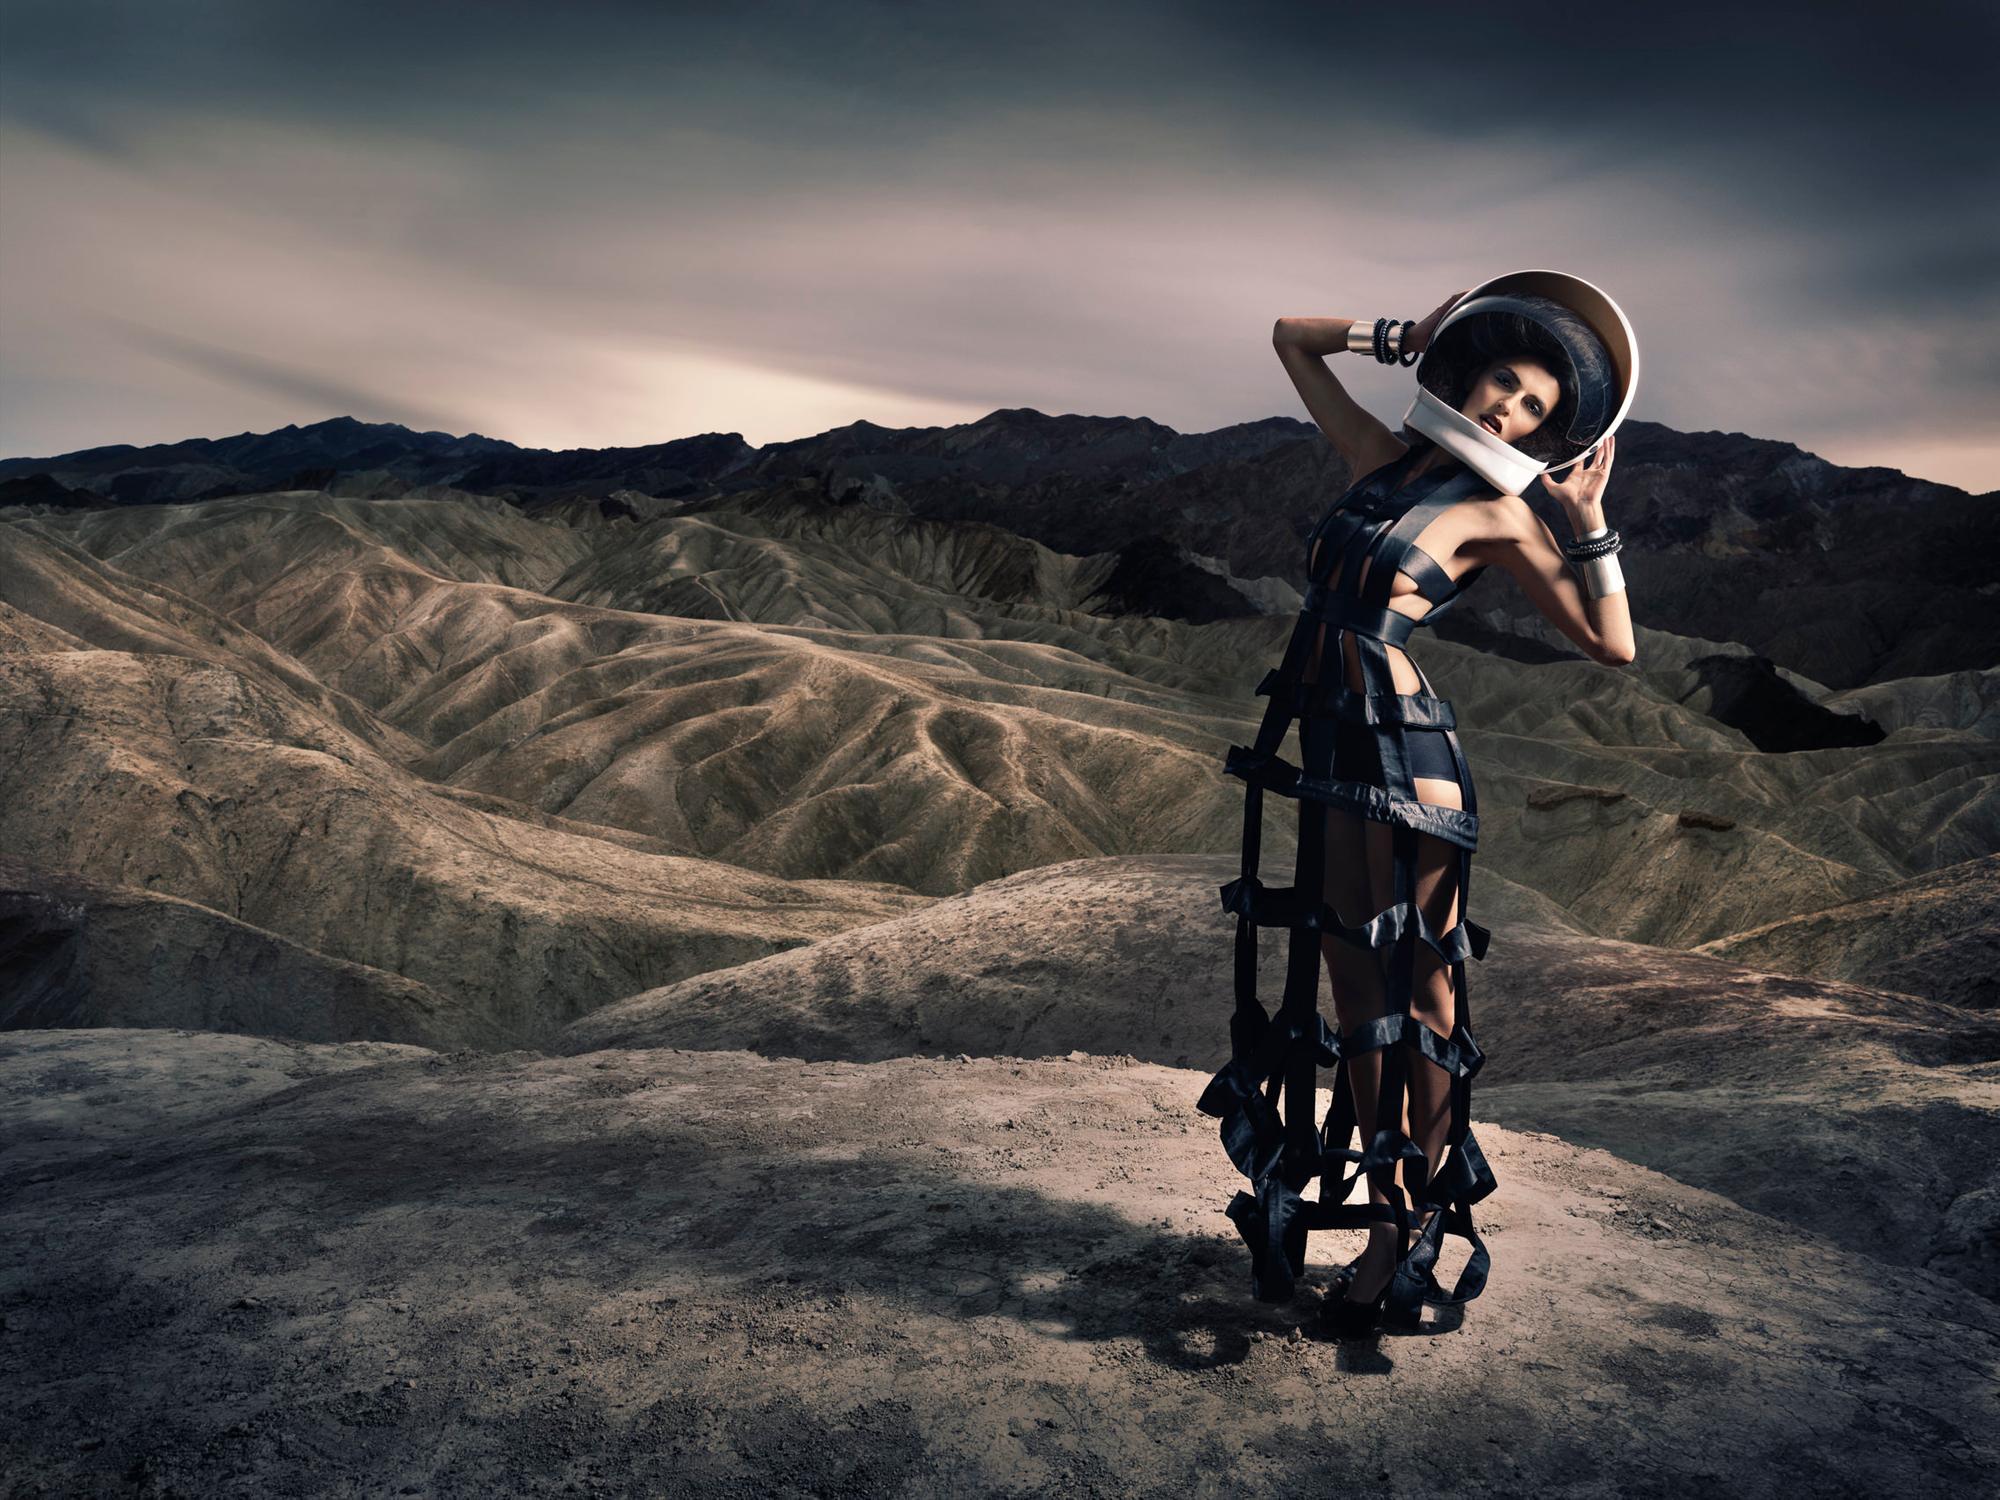 Hasselblad-photographer.jpg